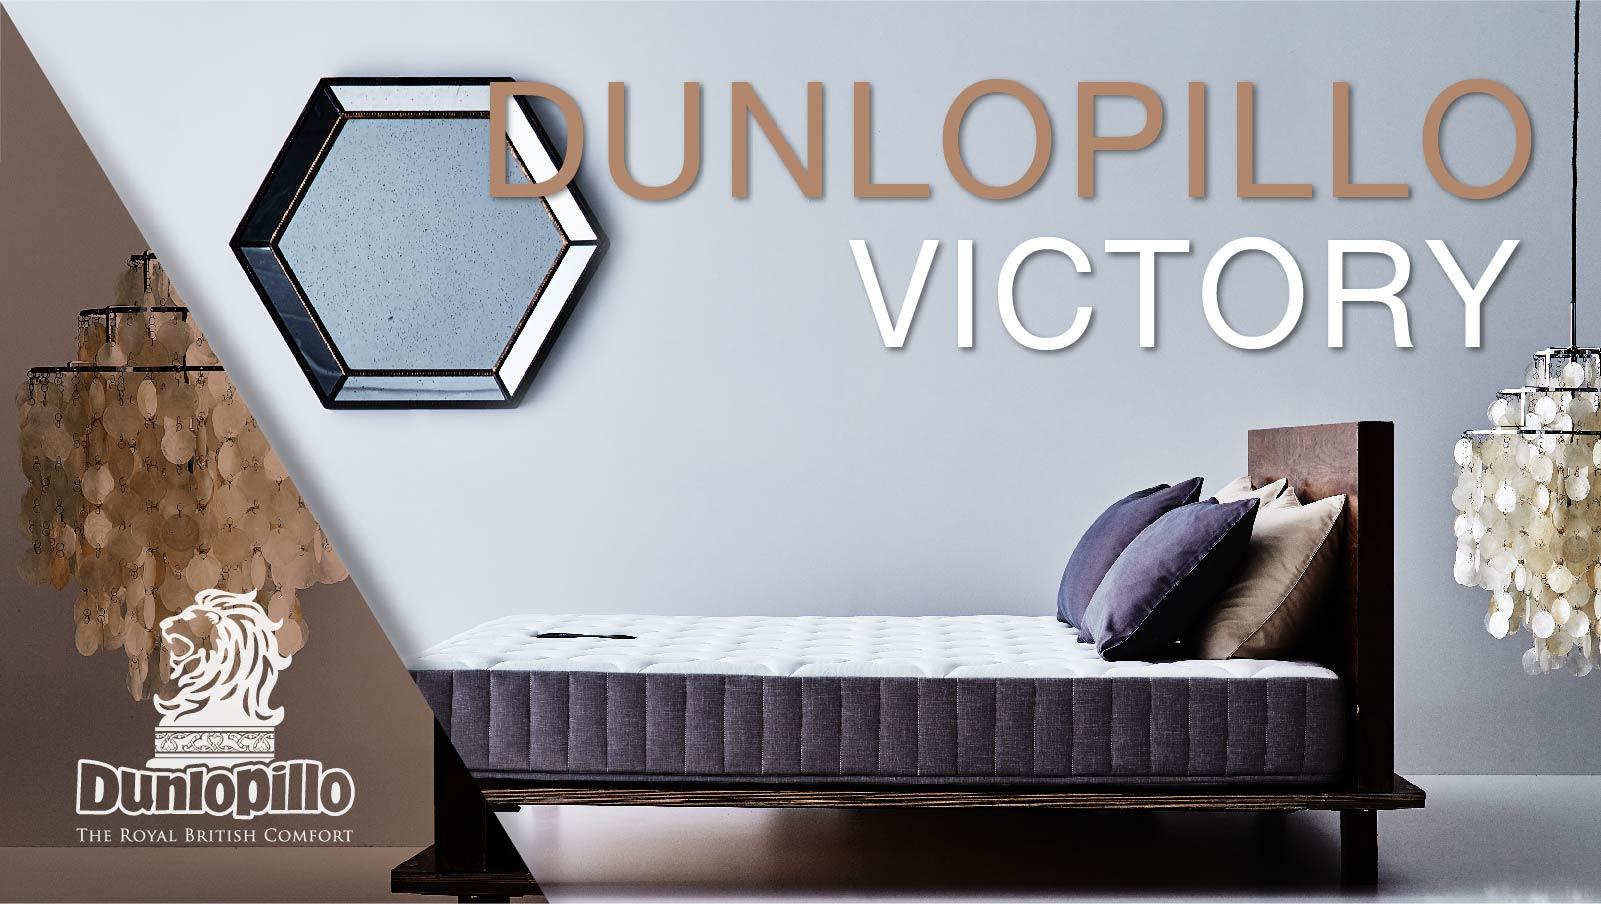 Dunlopillo Mattress - Victory